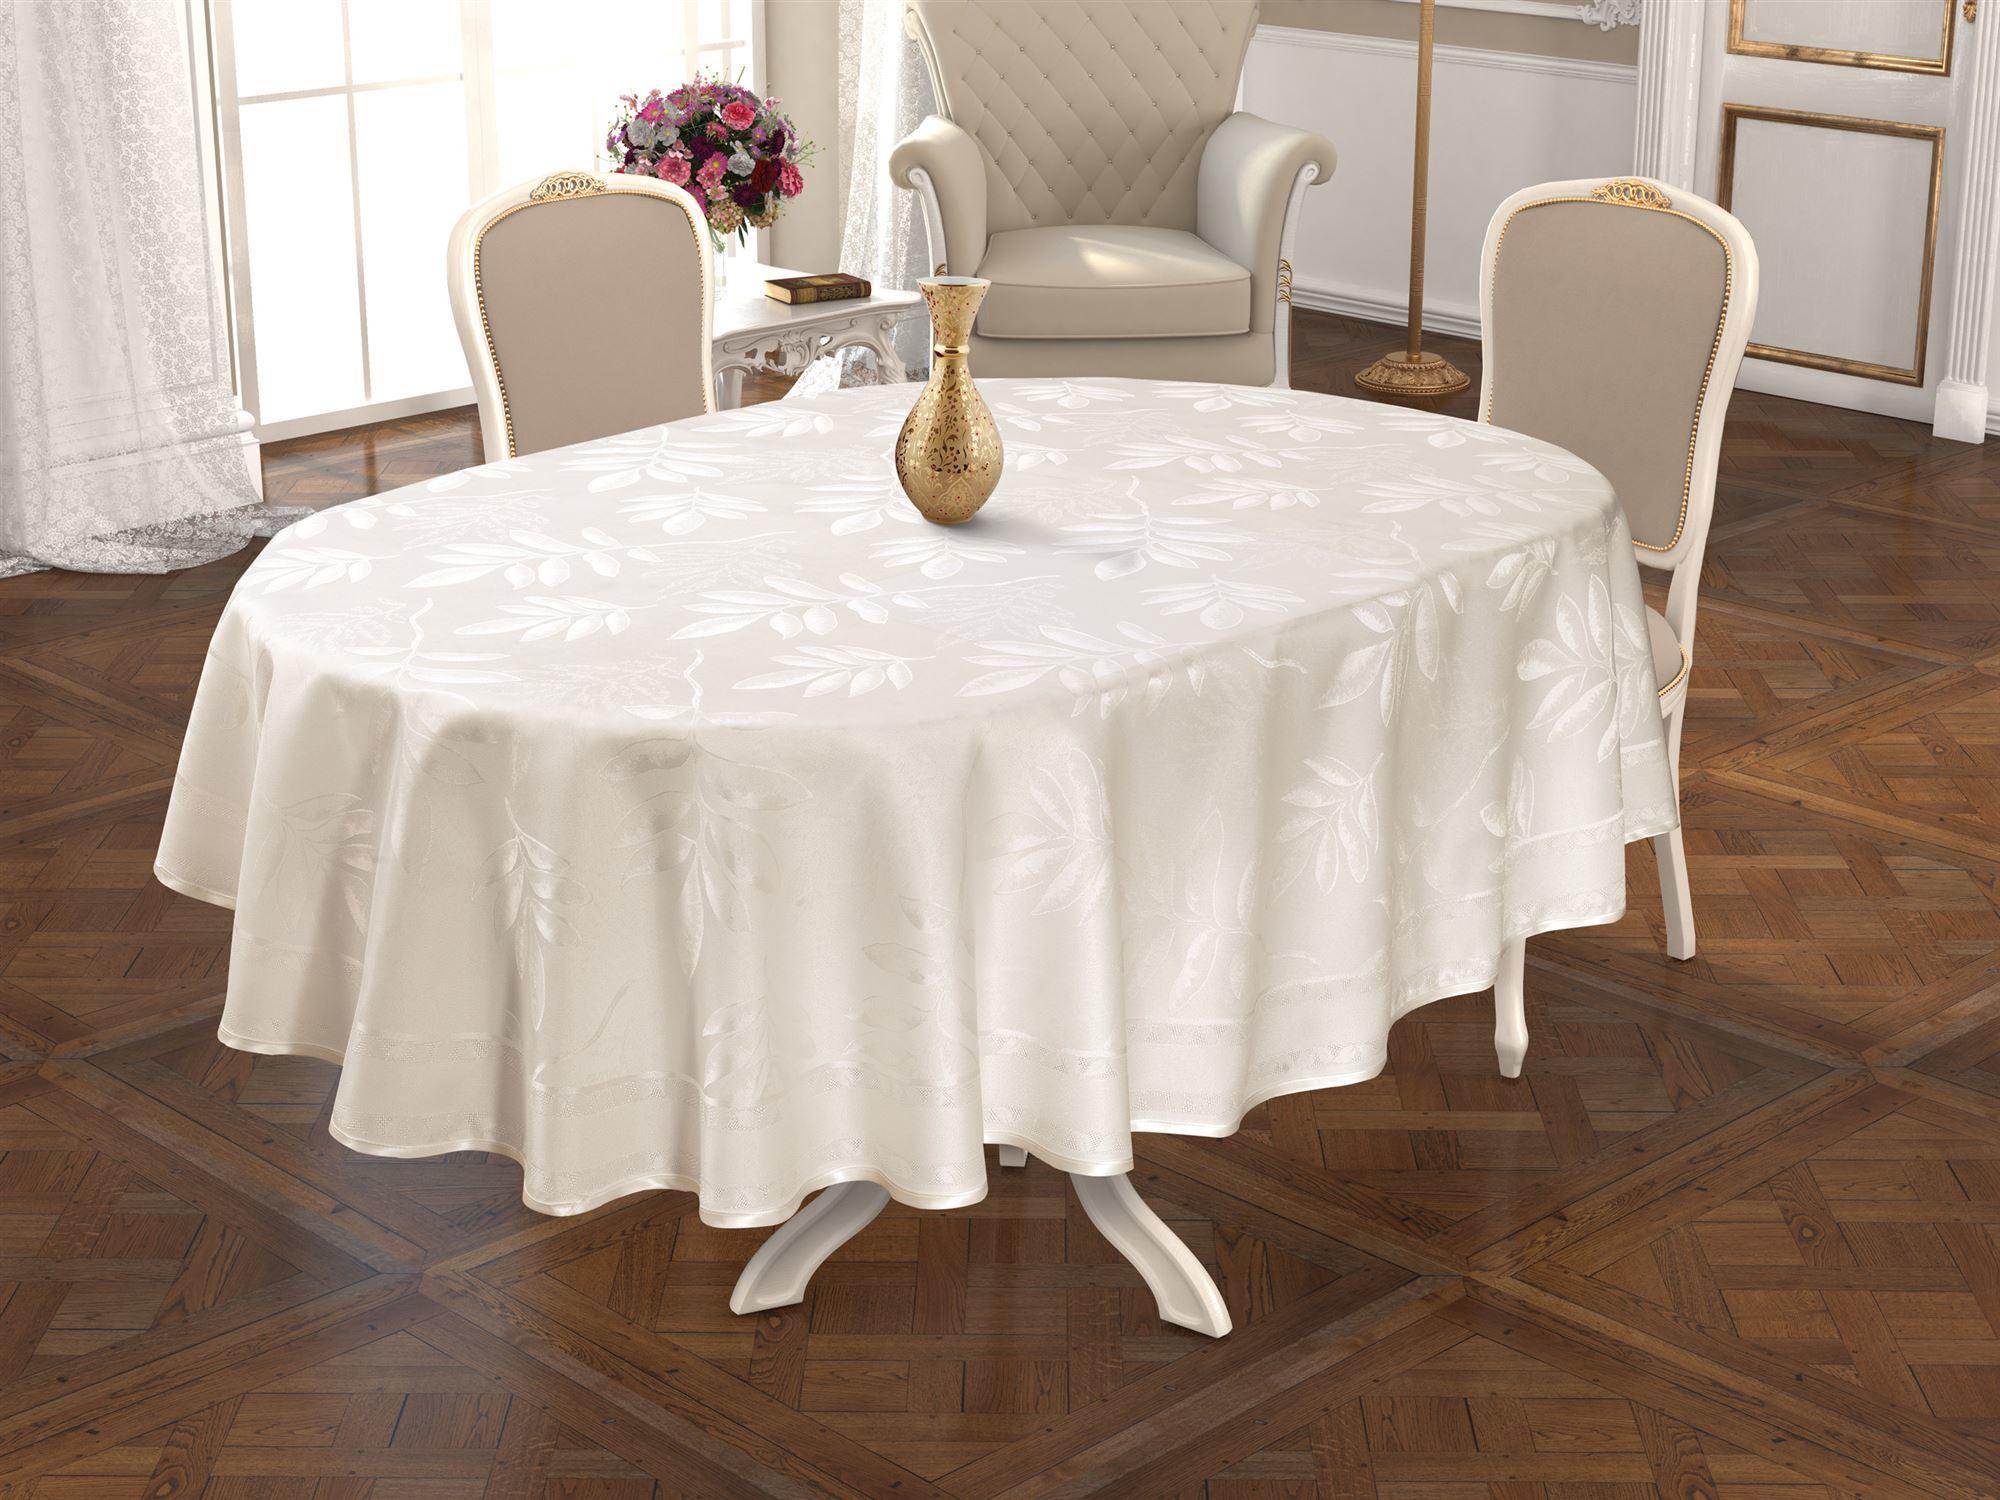 Фото скатерти на столе